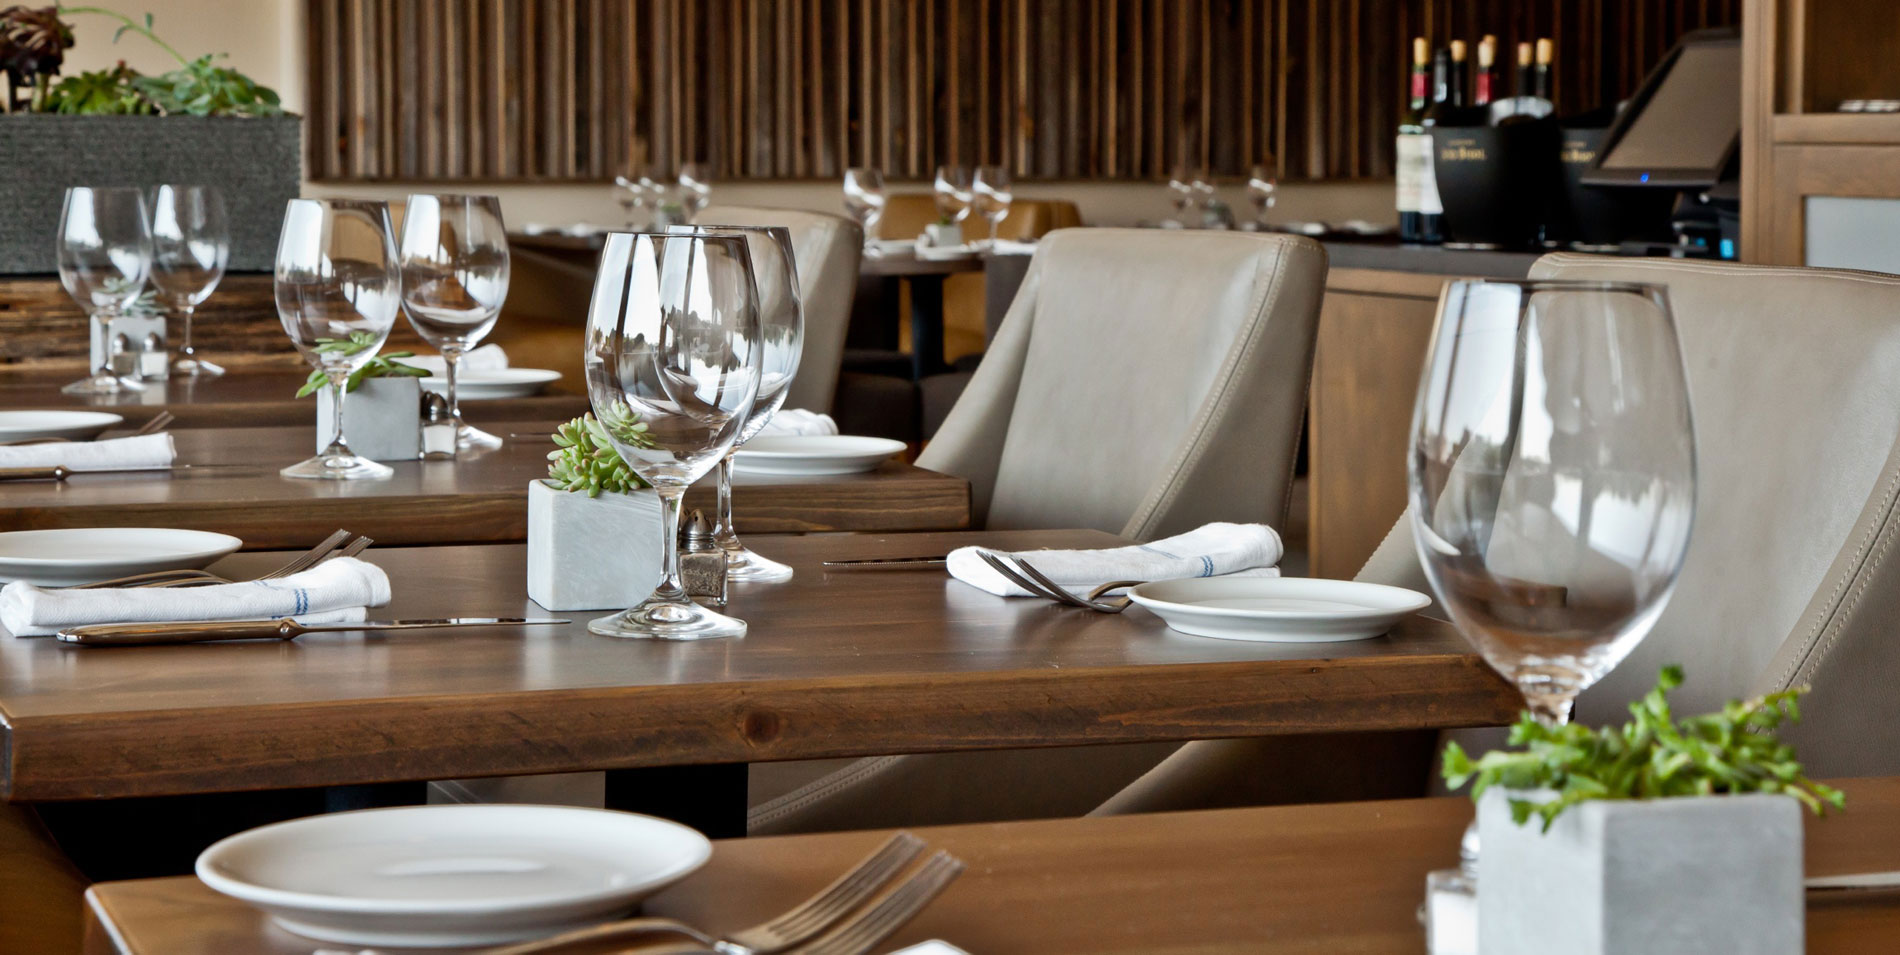 V's restaurant + bar malibu | great food + great drinks +